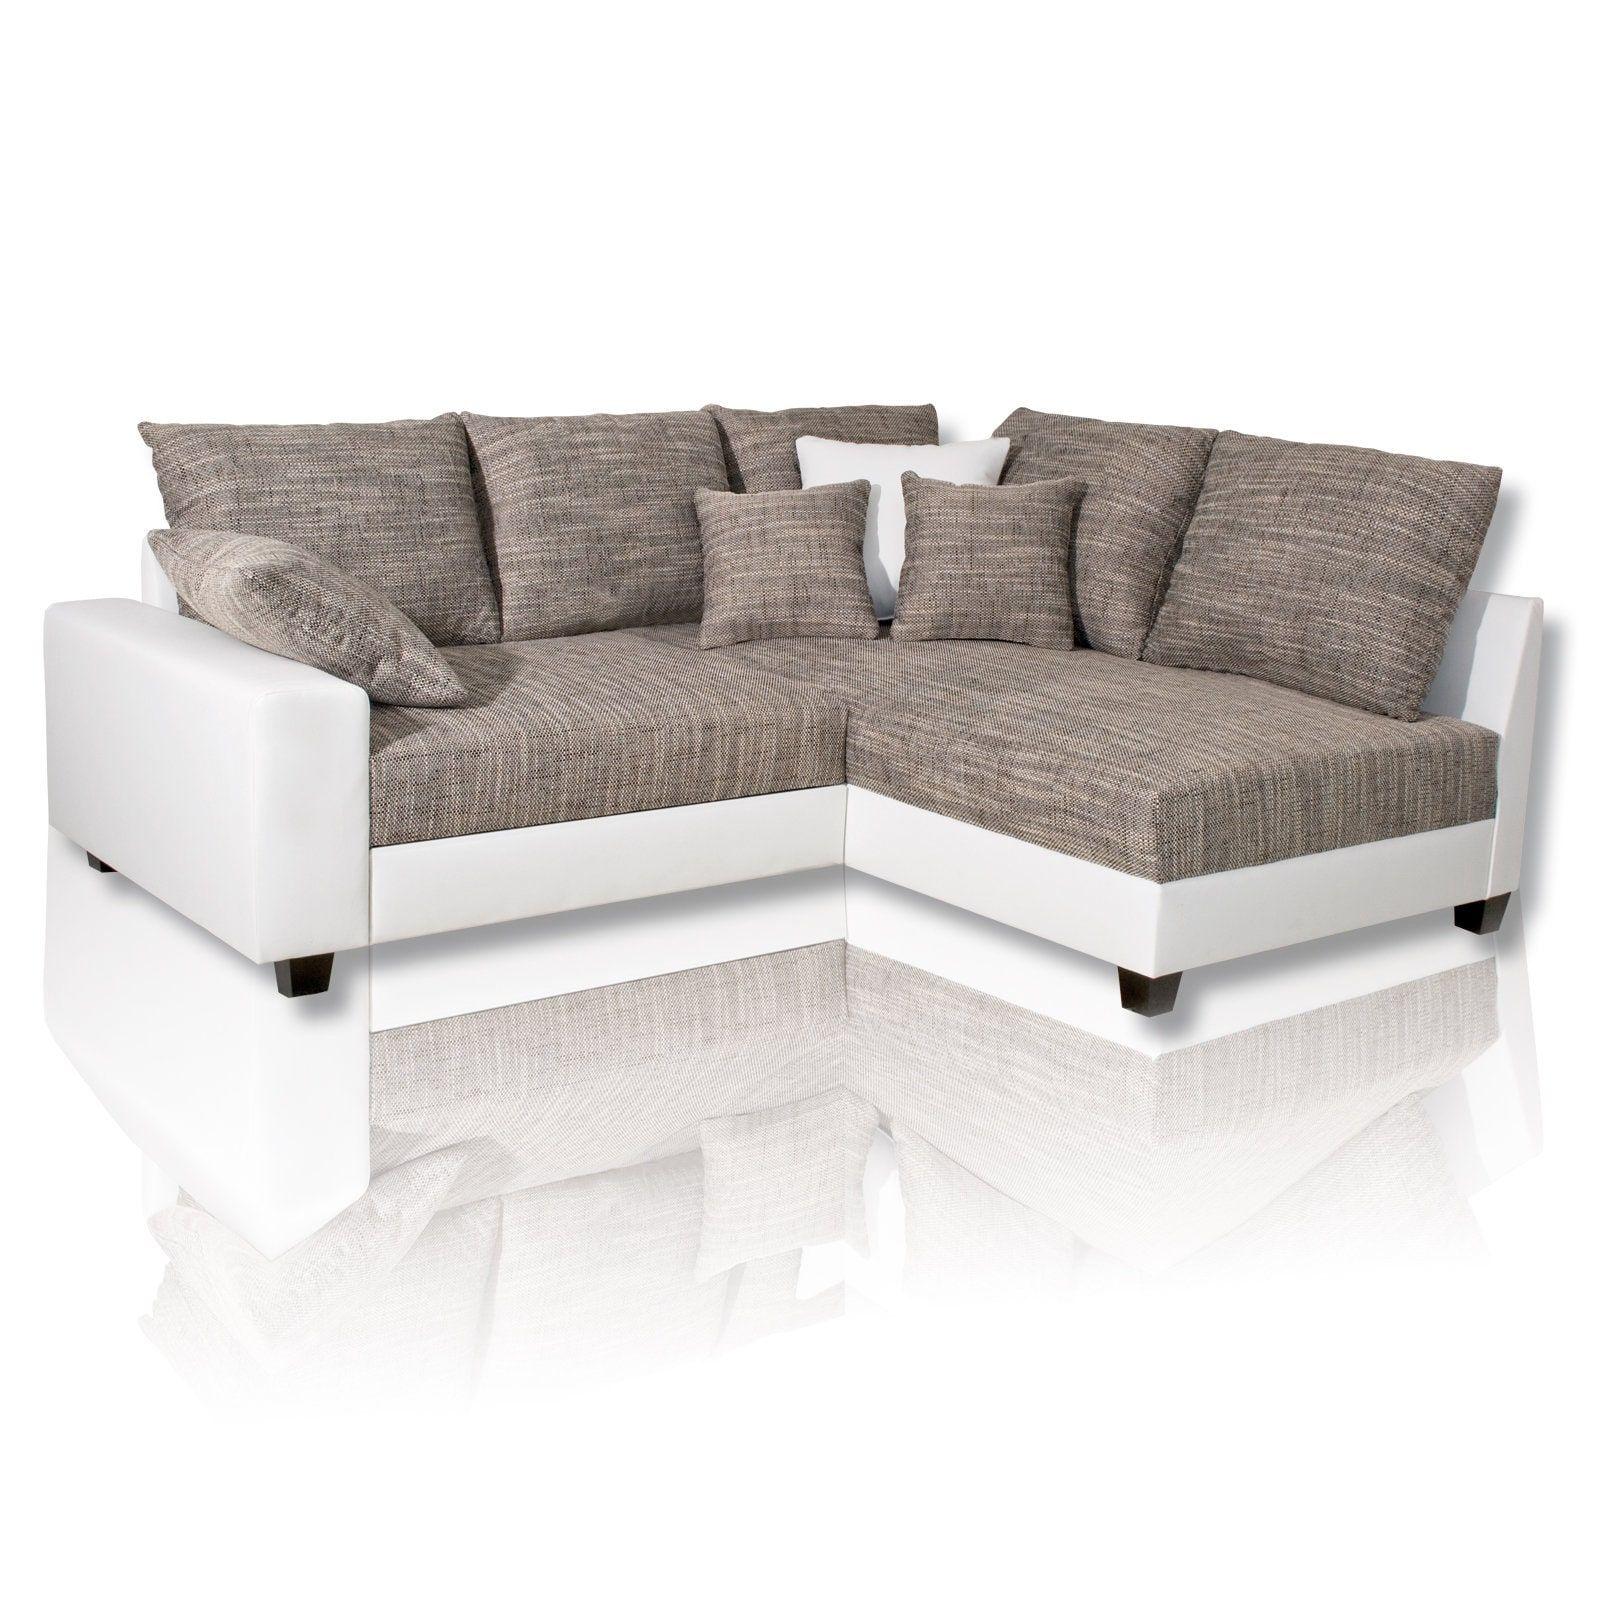 Nett Roller Ecksofa Deutsche In 2019 Sofa Couch Furniture